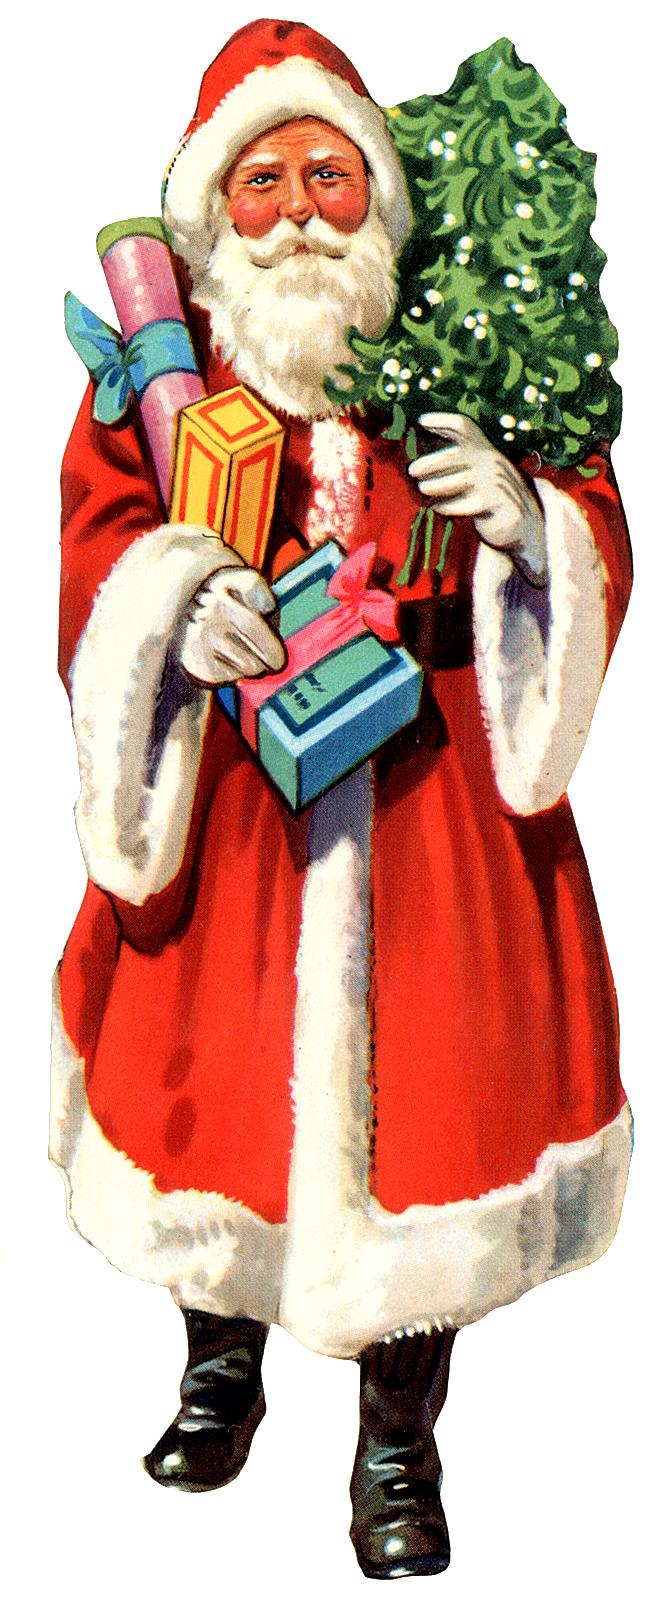 Vintage Santa with presents and Christmas tree